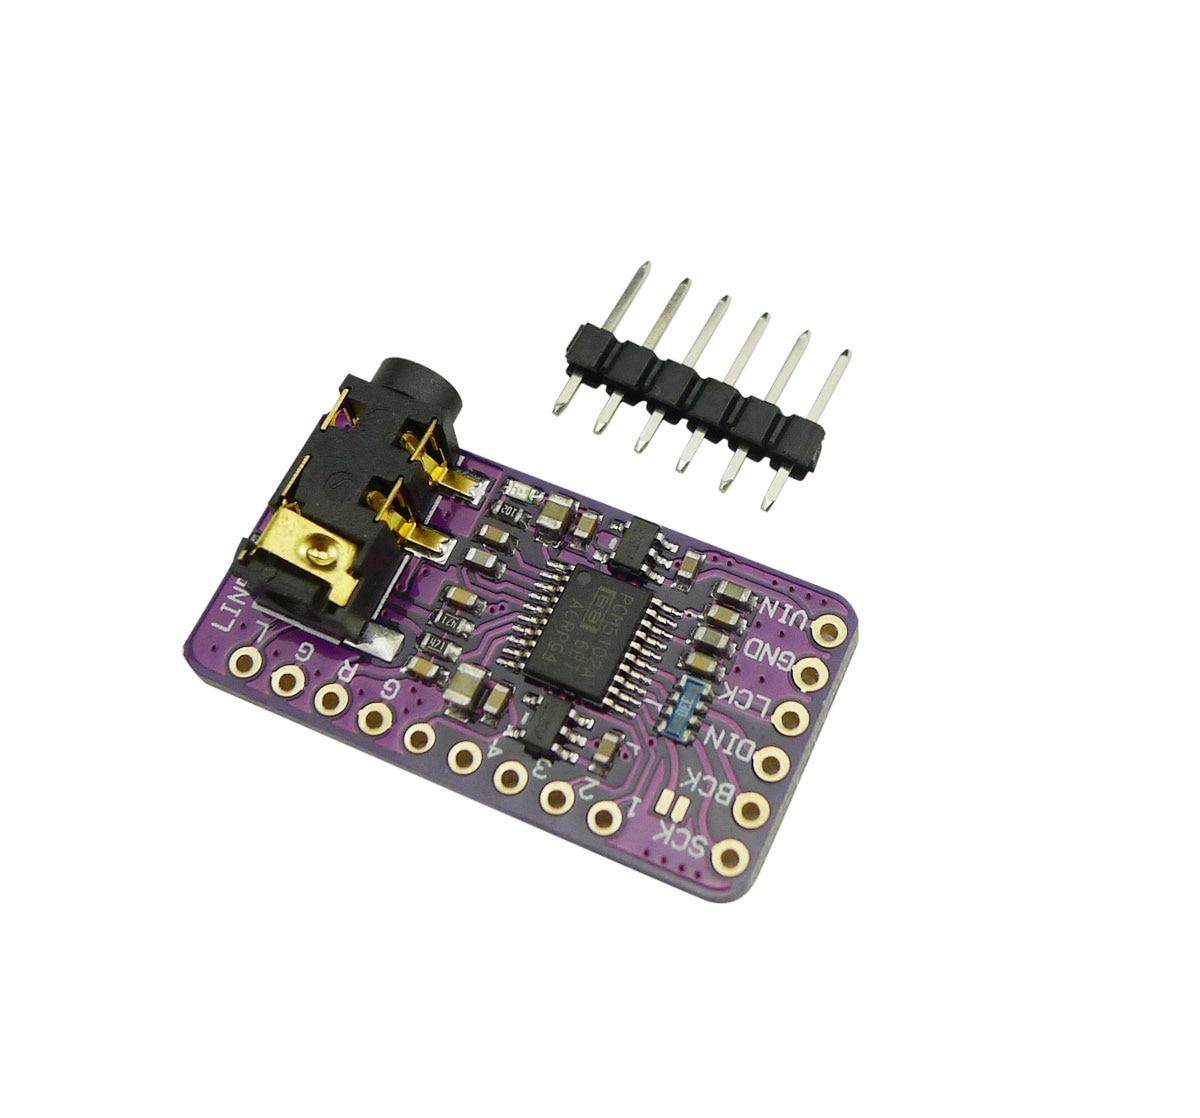 Aihasd Interface I2S PCM5102 DAC Decoder GY-PCM5102 I2S Player Modul Für Raspberry Pi pHAT Format Bord Digital Audio Board